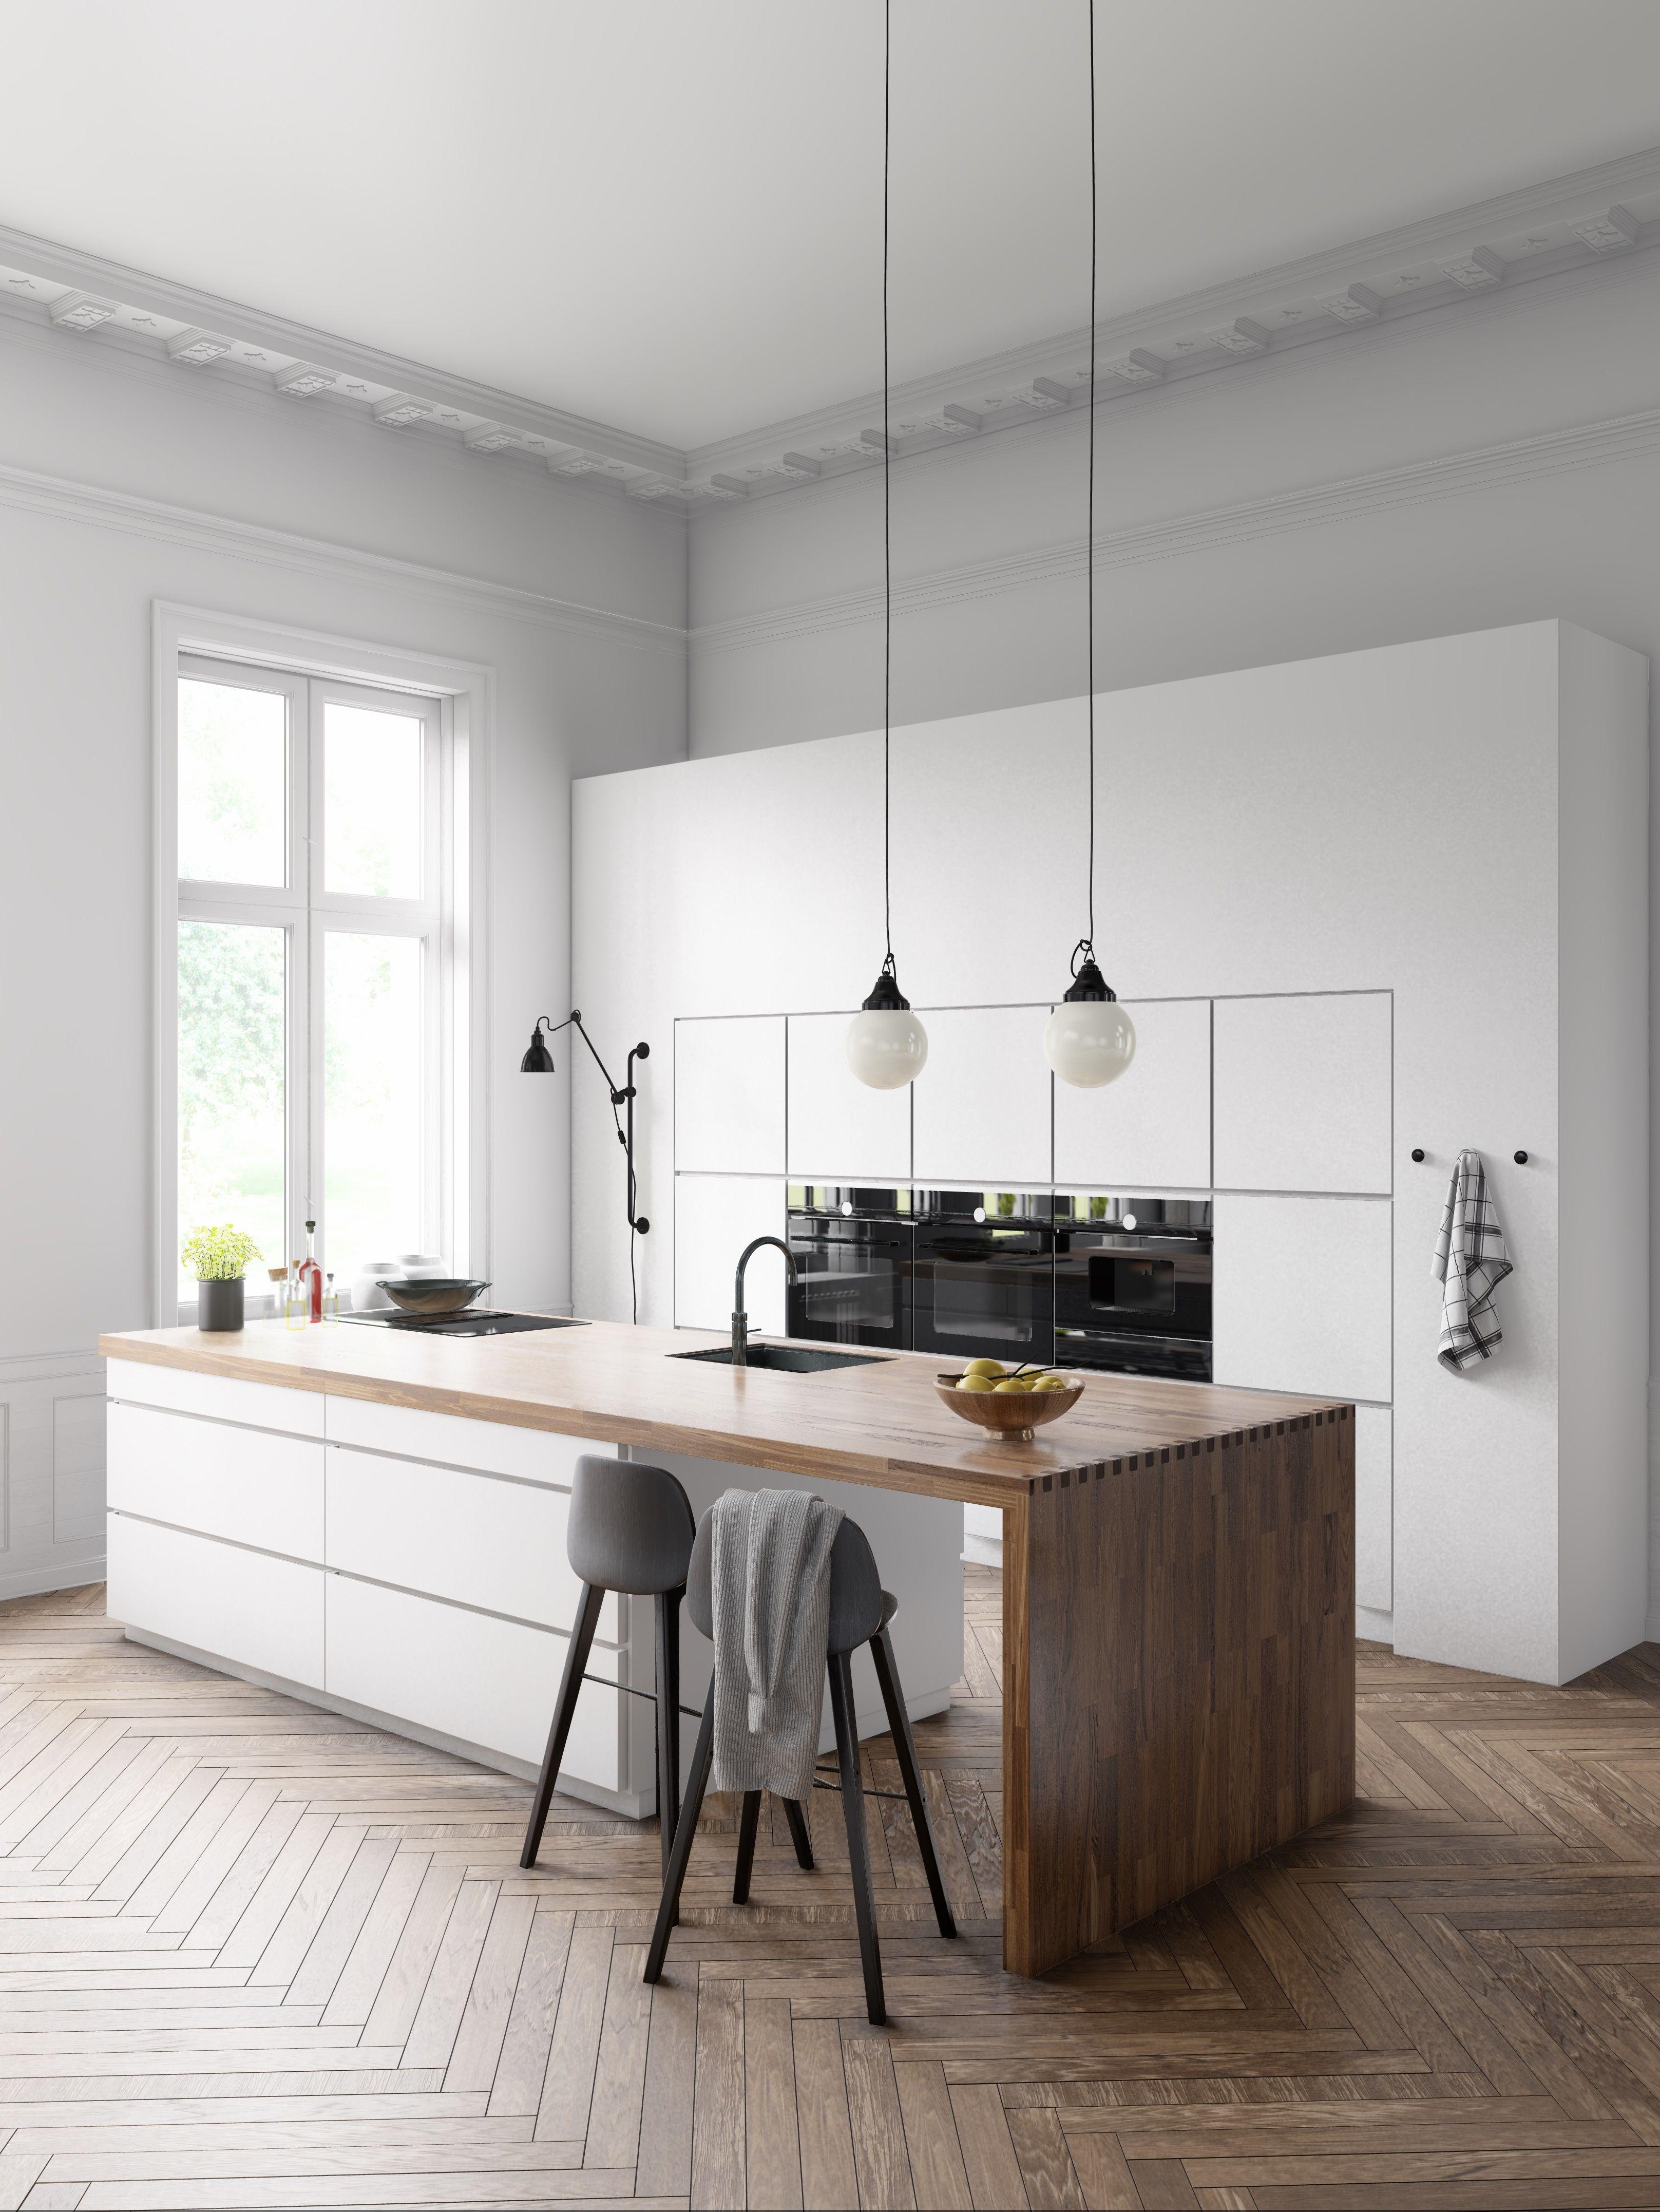 Scandinavian Kitchen White Mood Lumion Community In 2020 Kitchen Design Color Kitchen Tiles Design Classic White Kitchen